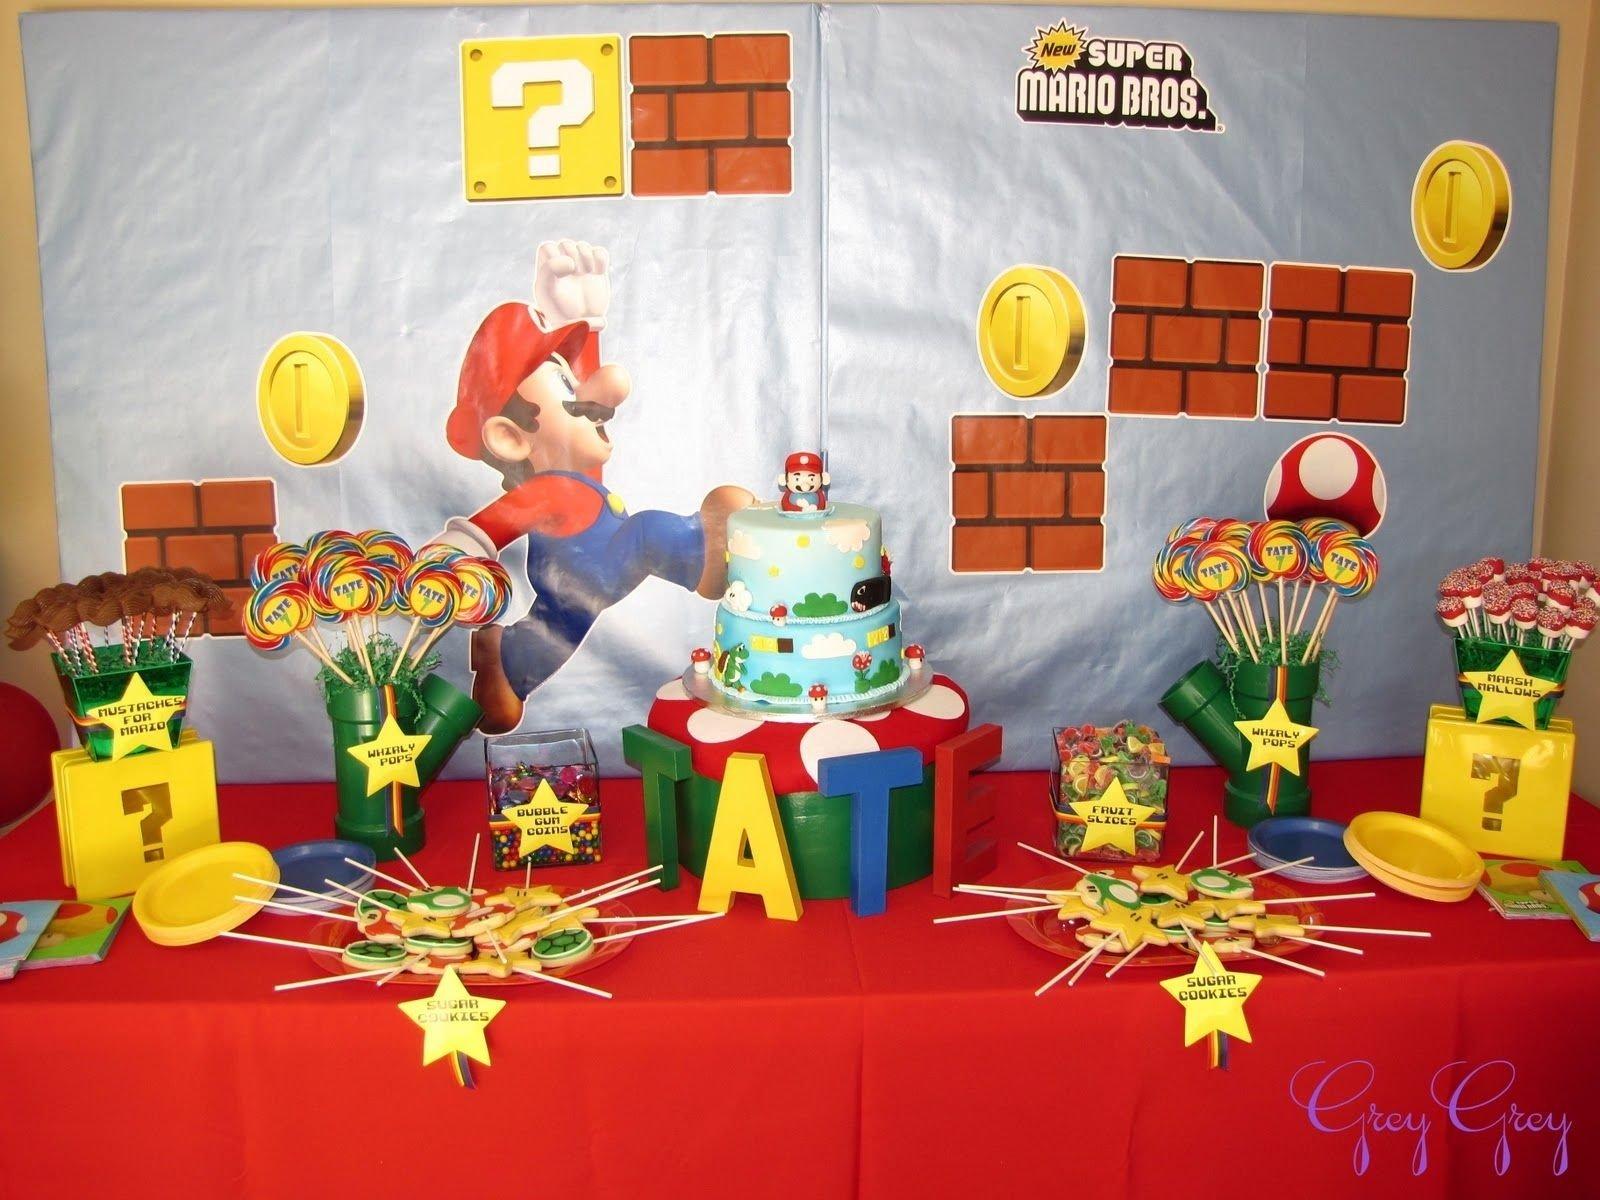 10 Stylish Super Mario Bros Birthday Party Ideas greygrey designs my parties super mario birthday party 5 2020